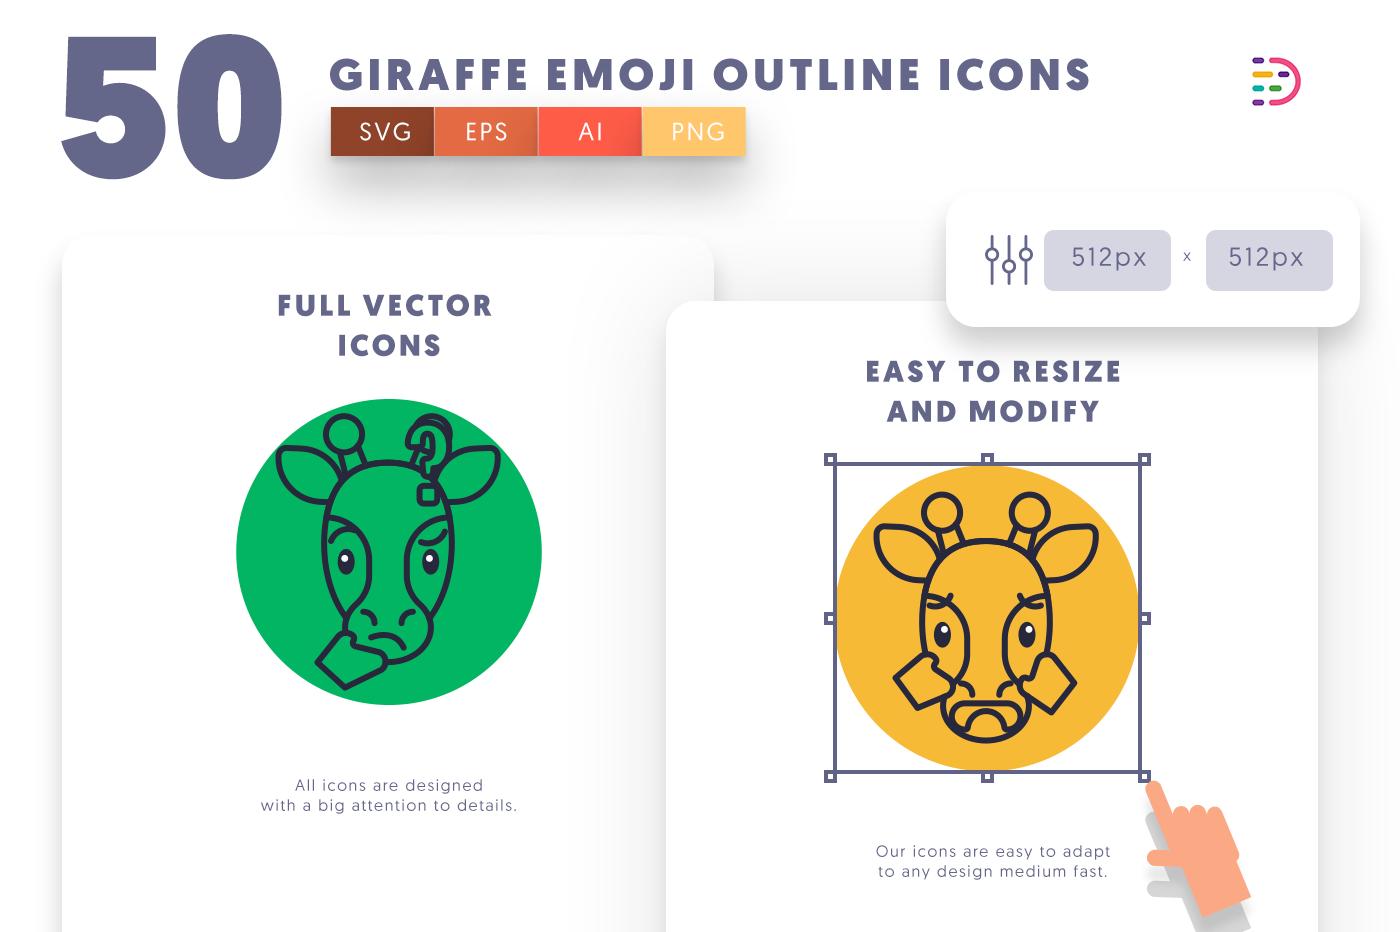 Full vector 50GiraffeEmojiOutline Icons